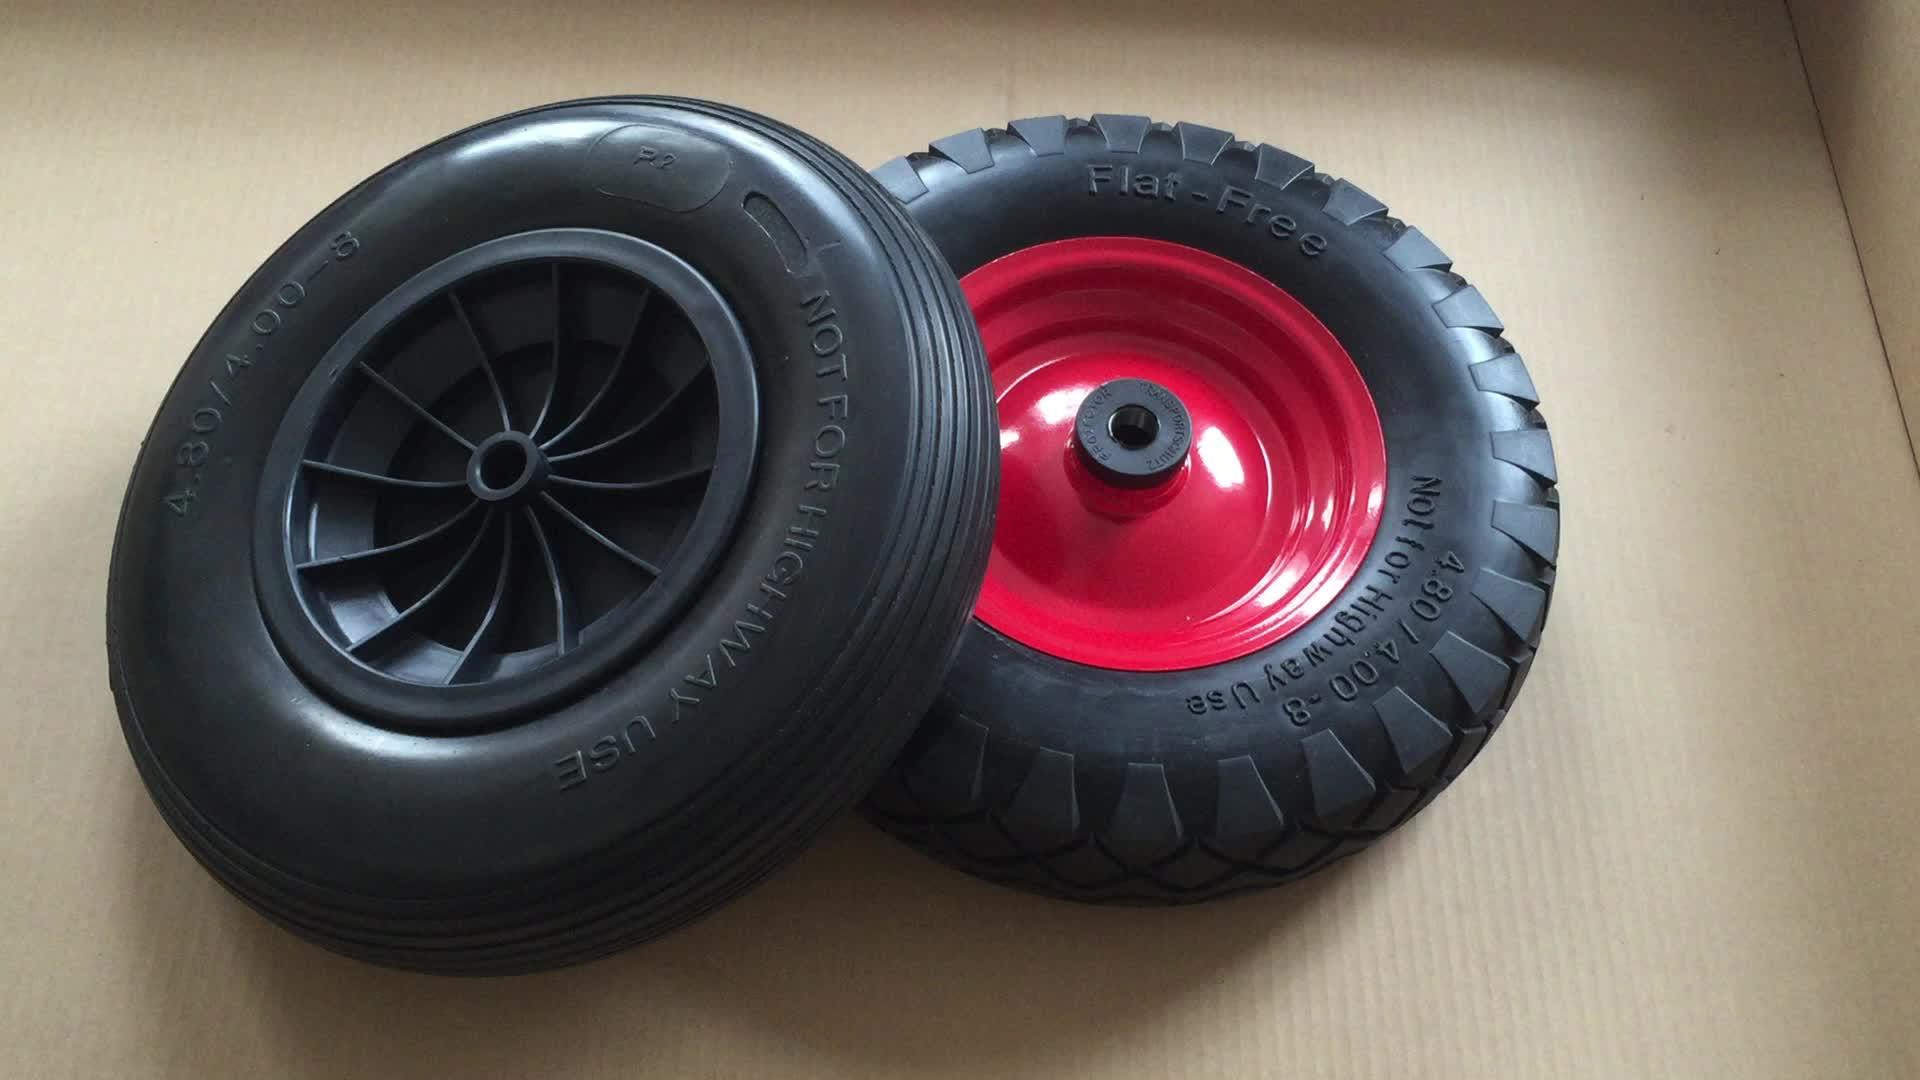 4.80/4.00-8 Polyurethane Stair Sack Truck Wheels